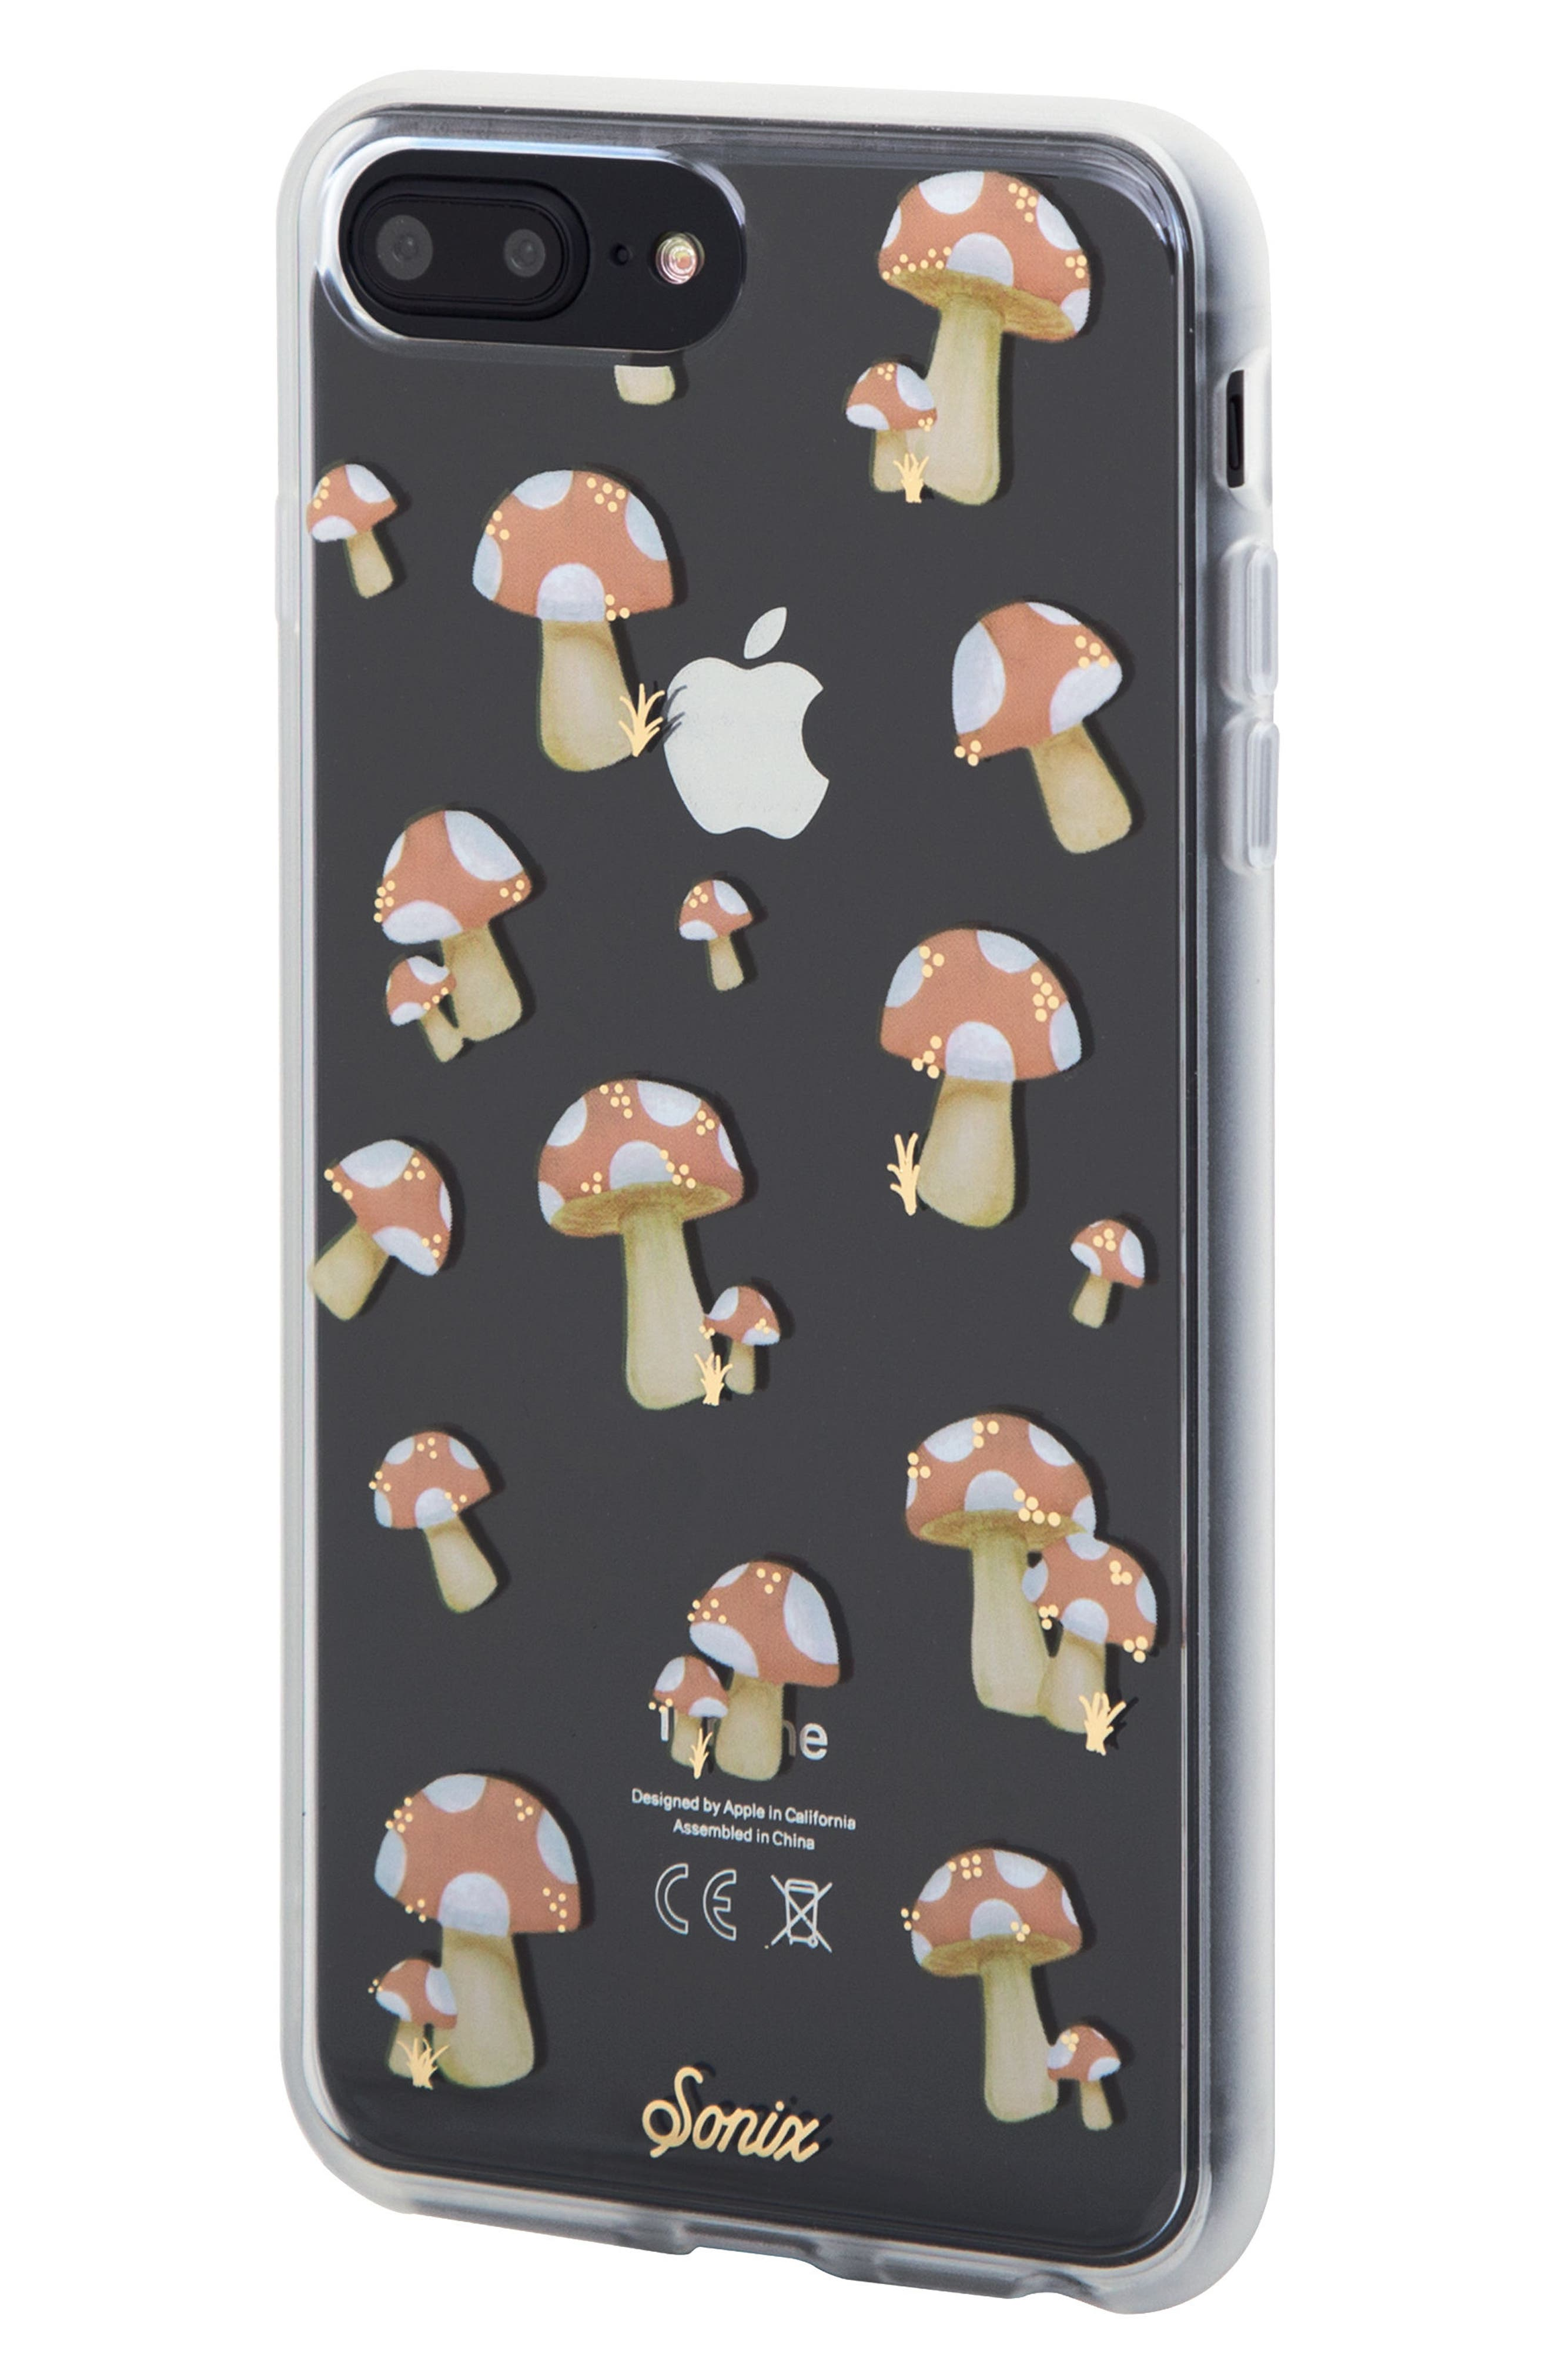 Mushroom iPhone 6/6s/7/8 & 6/6s/7/8 Plus Case,                             Alternate thumbnail 2, color,                             650